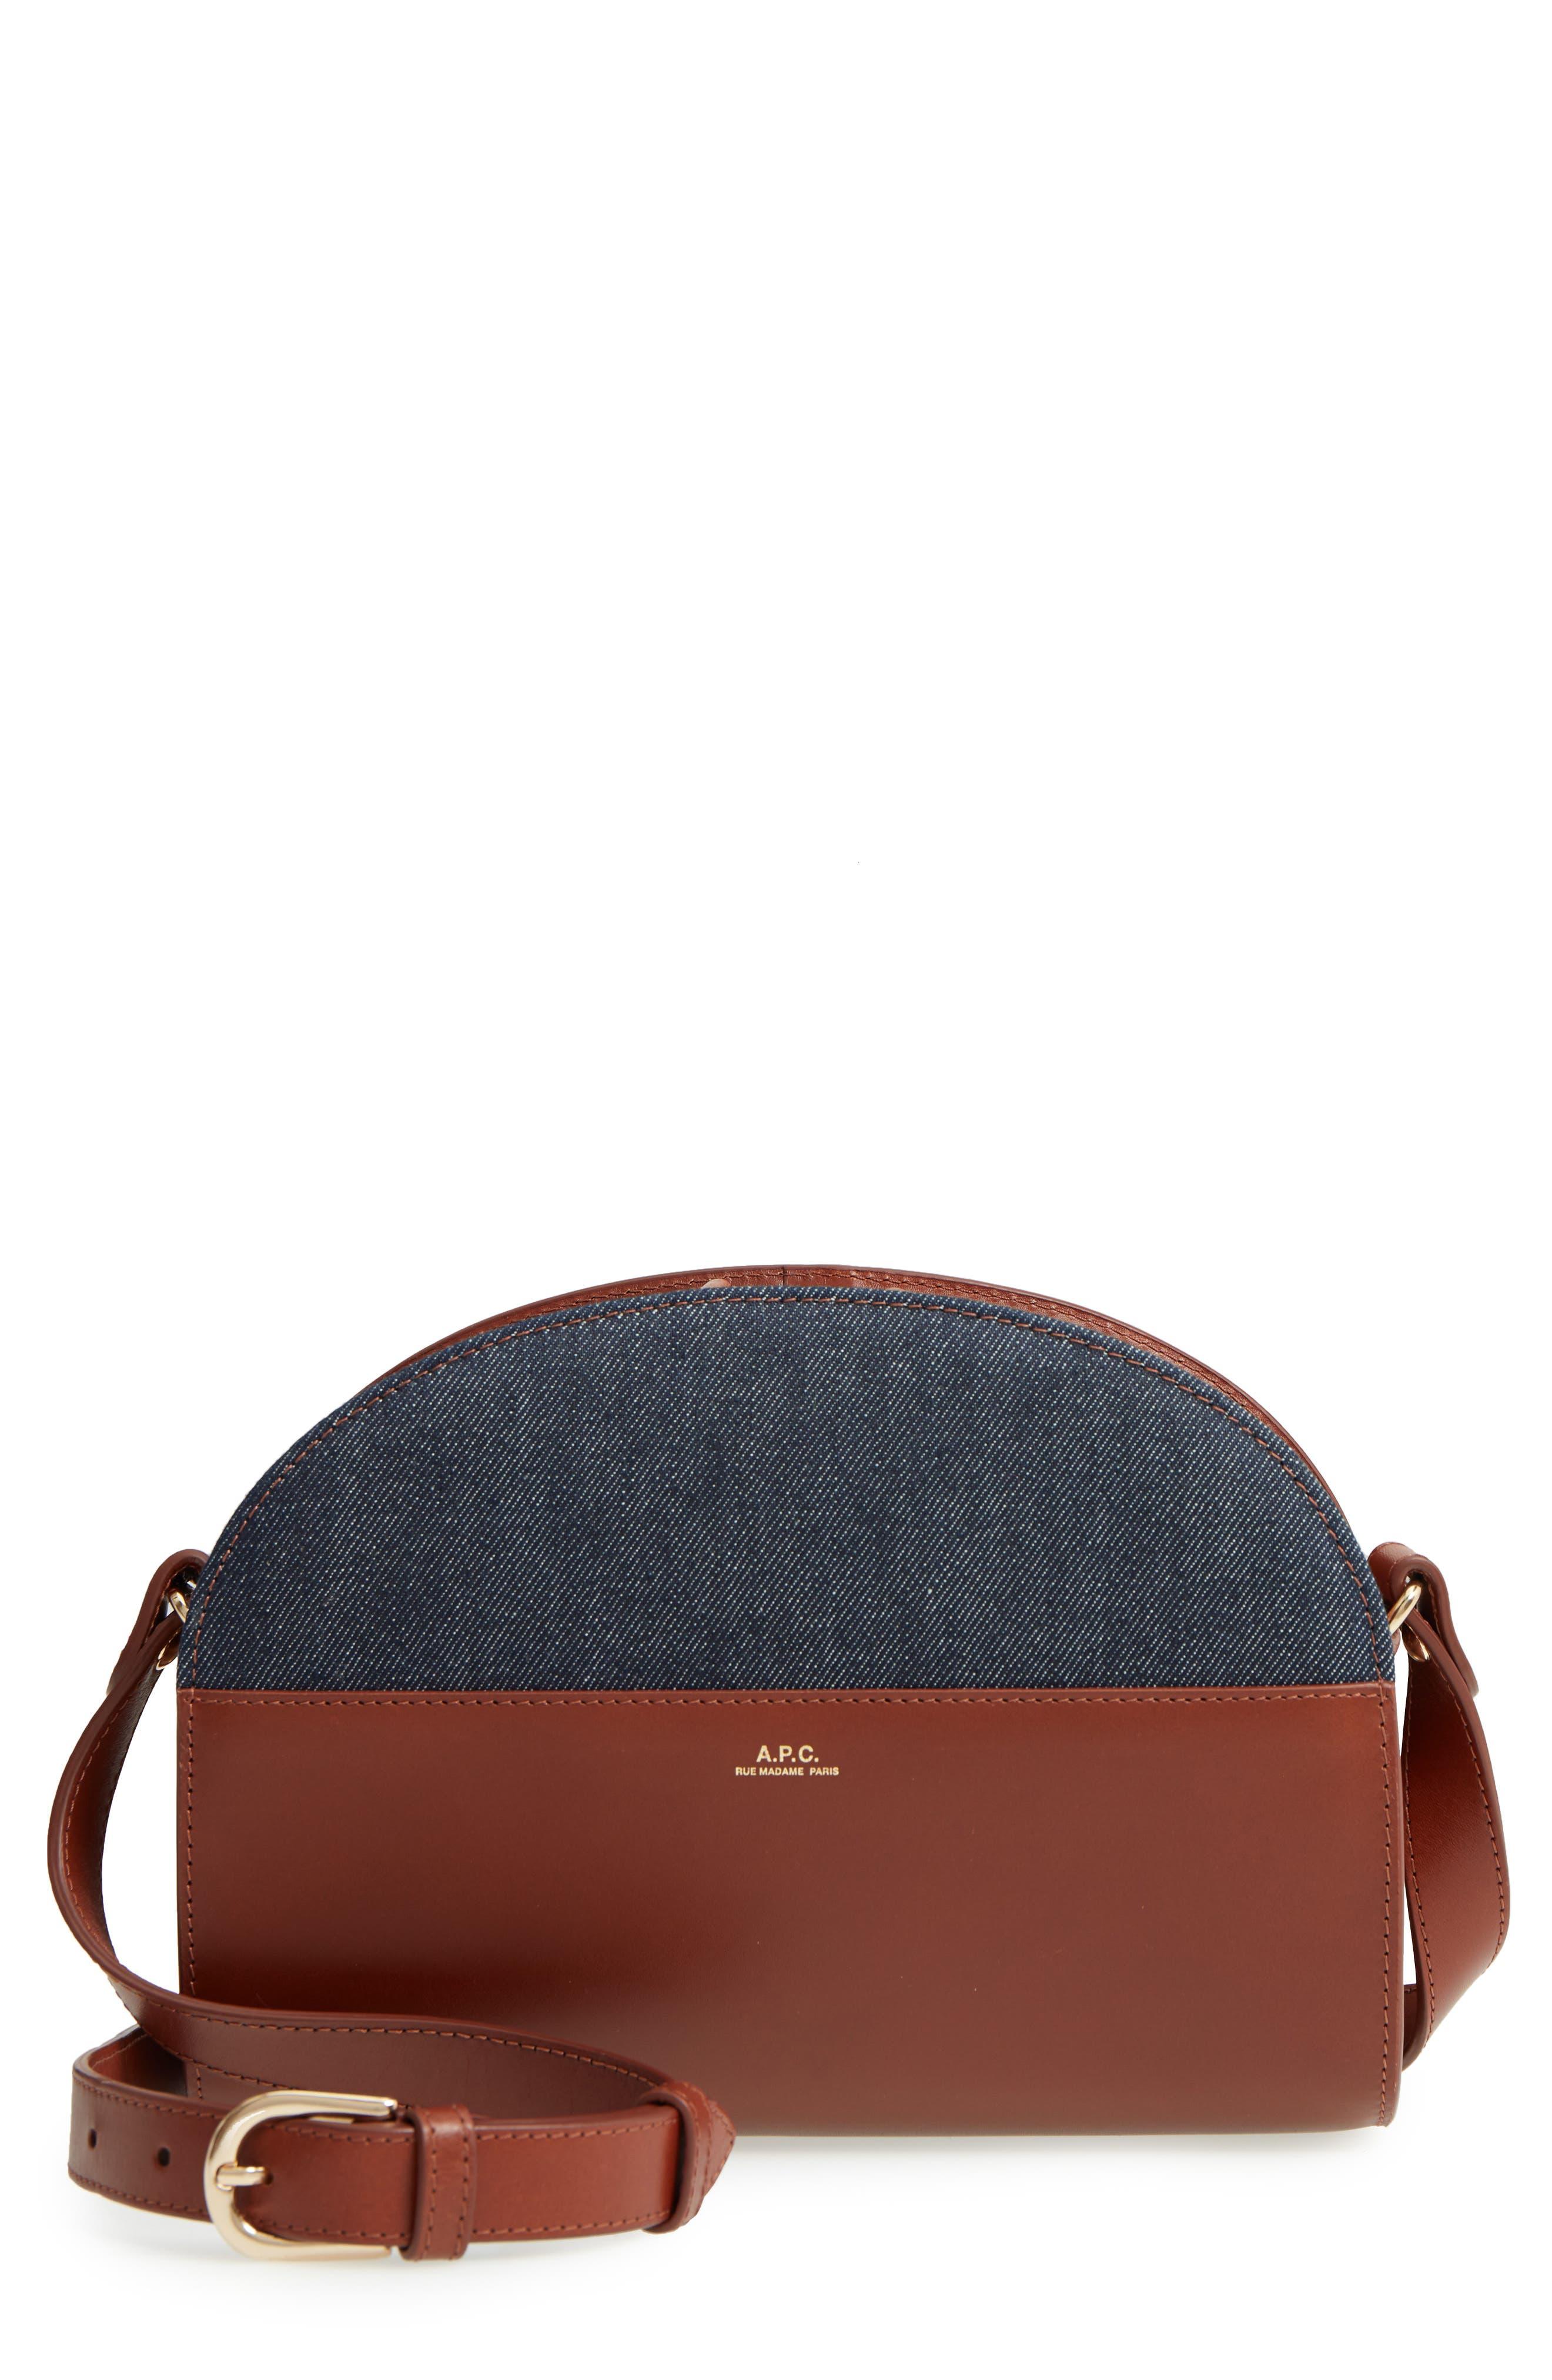 A.P.C. Sac Demilune Leather & Denim Crossbody Bag, Main, color, 242